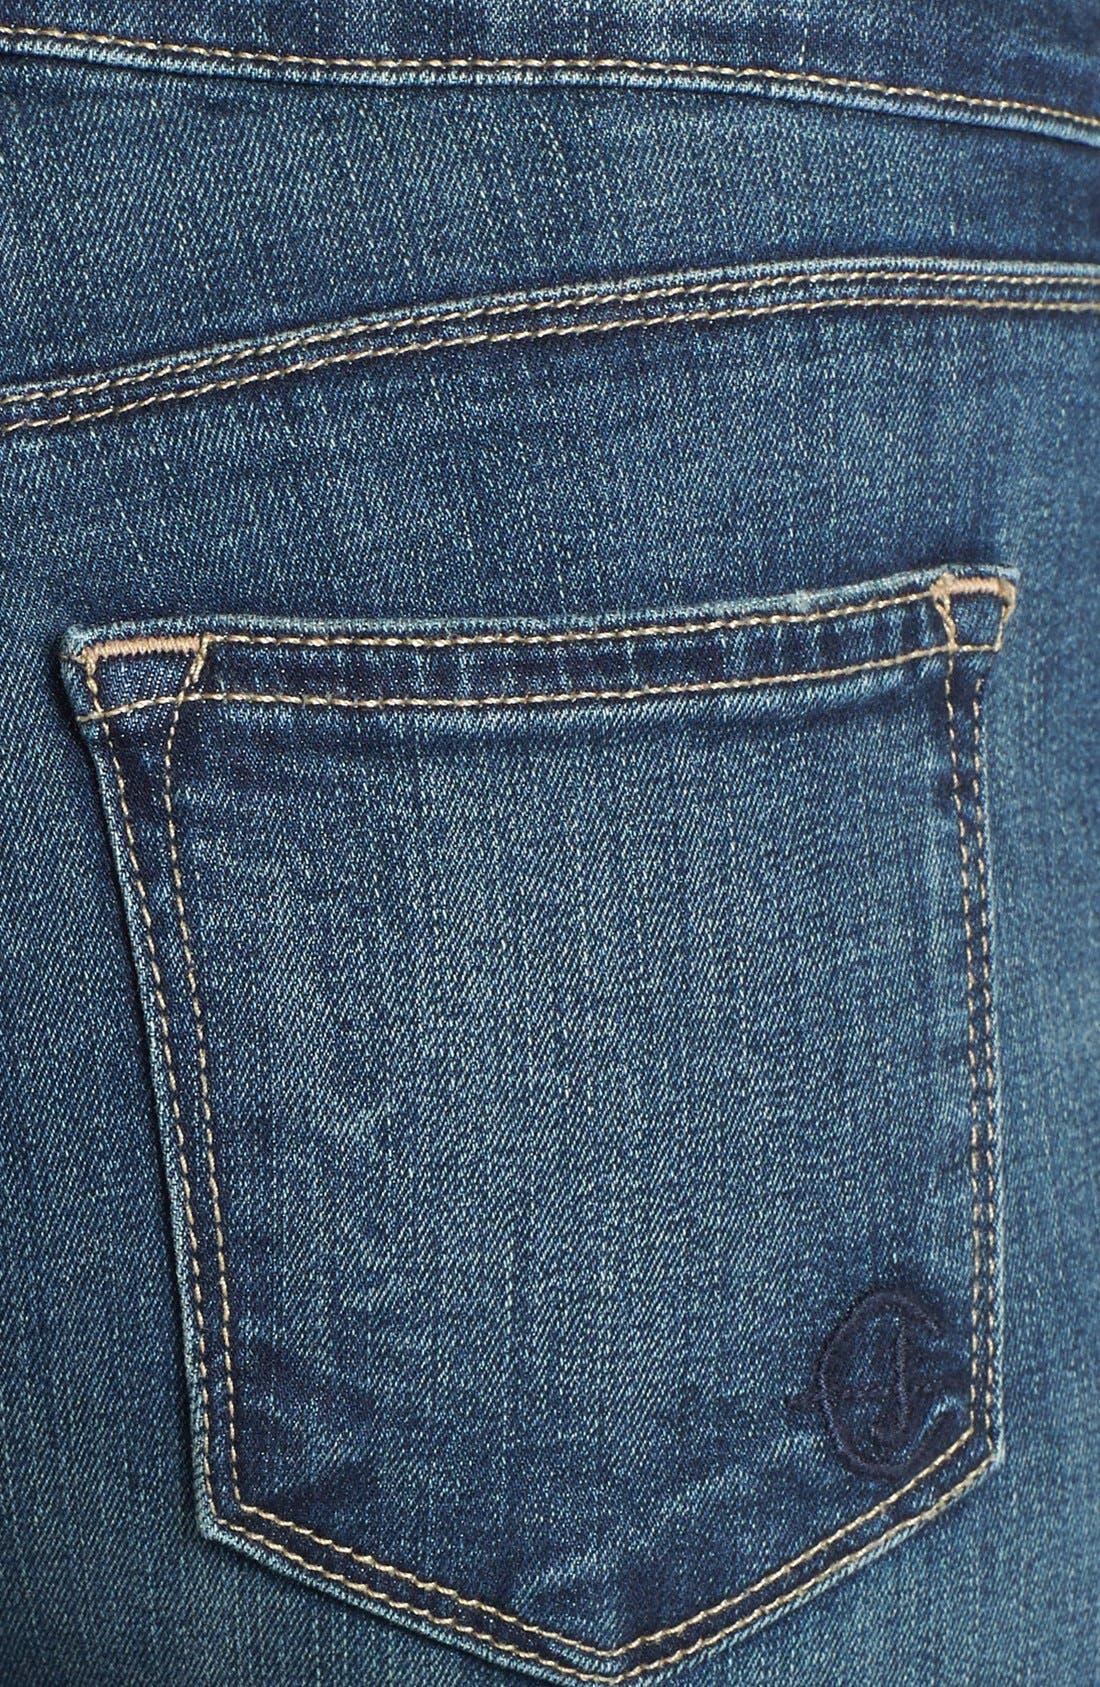 Alternate Image 3  - CJ by Cookie Johnson 'Rejoice' Stretch Crop Boyfriend Jeans (Tops)